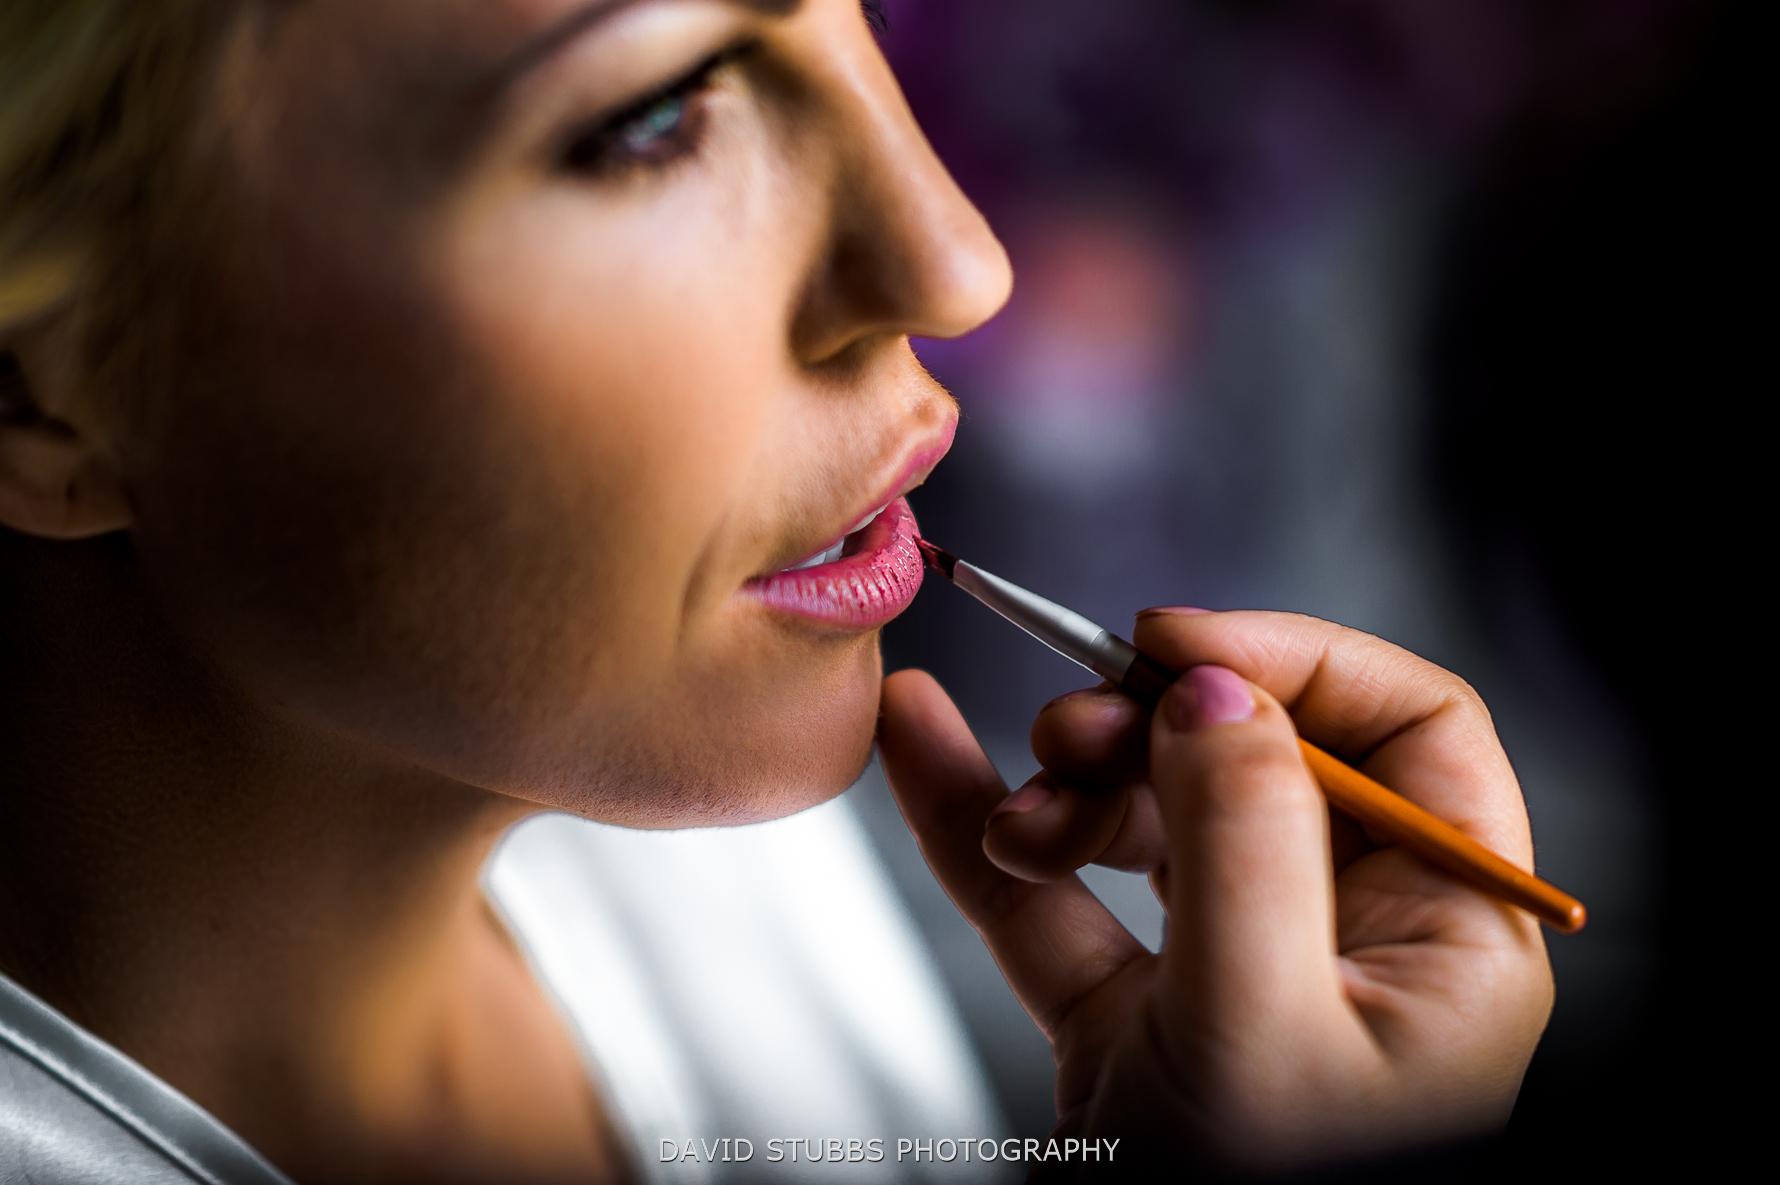 lipstick applied